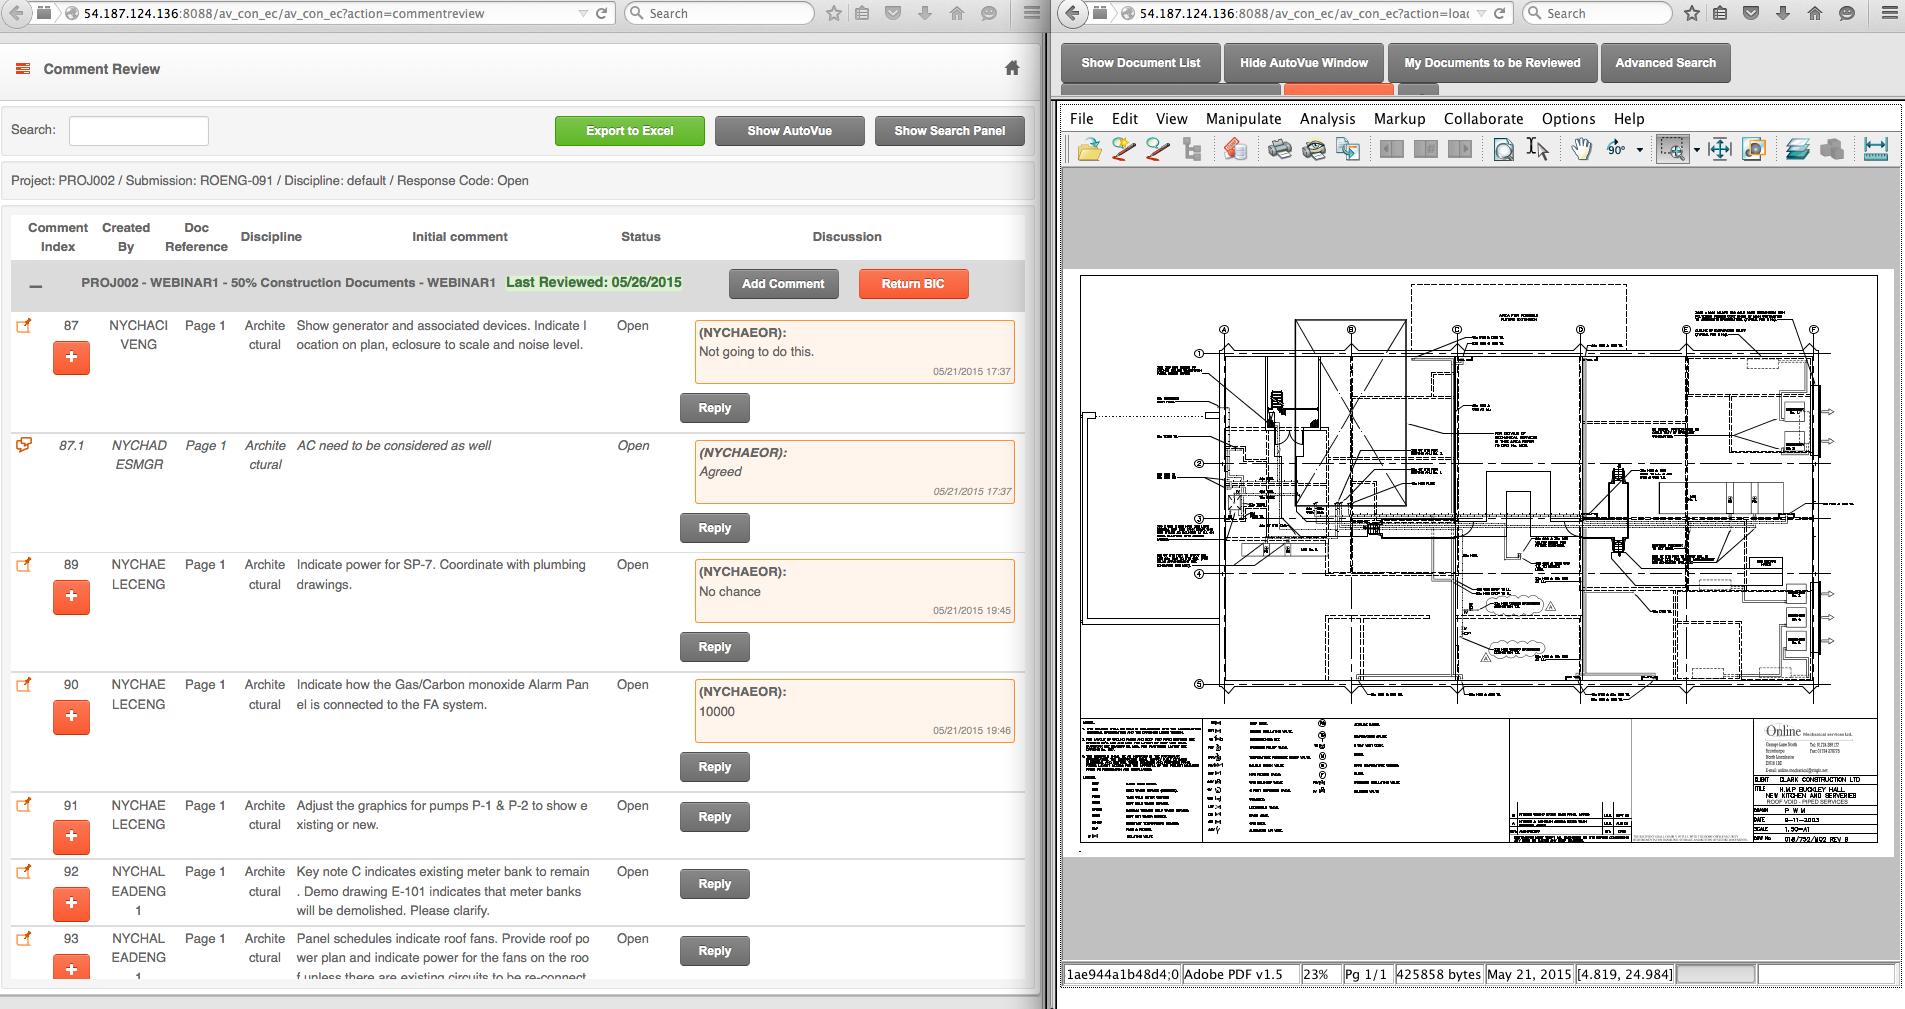 20150707 - Blog Graphic Tracking Portal